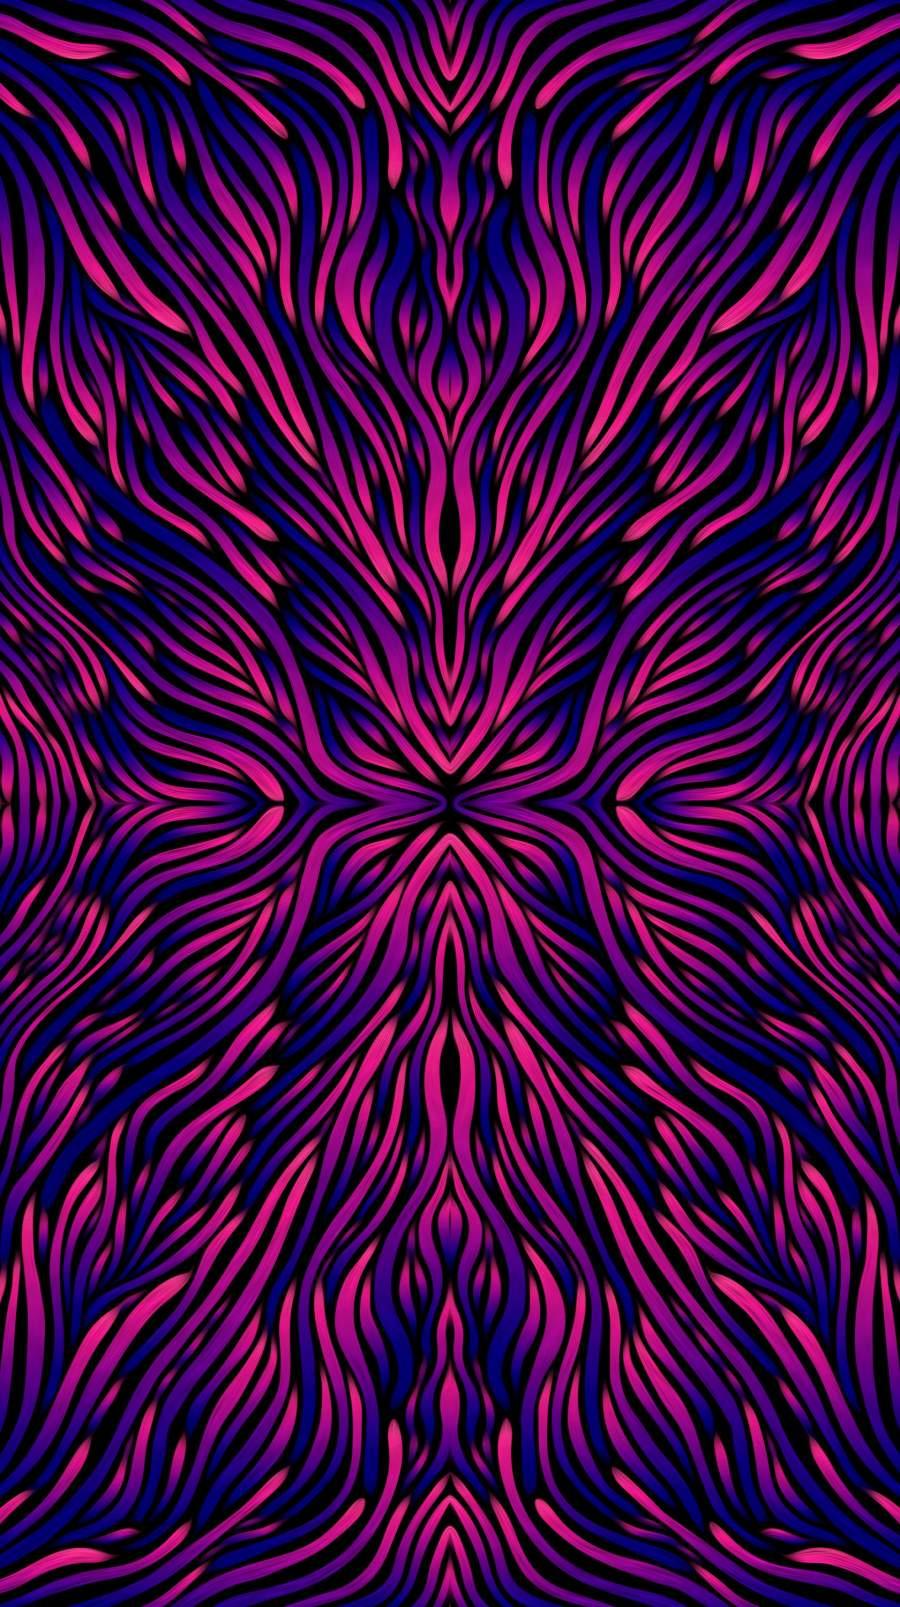 Illusion Art iPhone Wallpaper